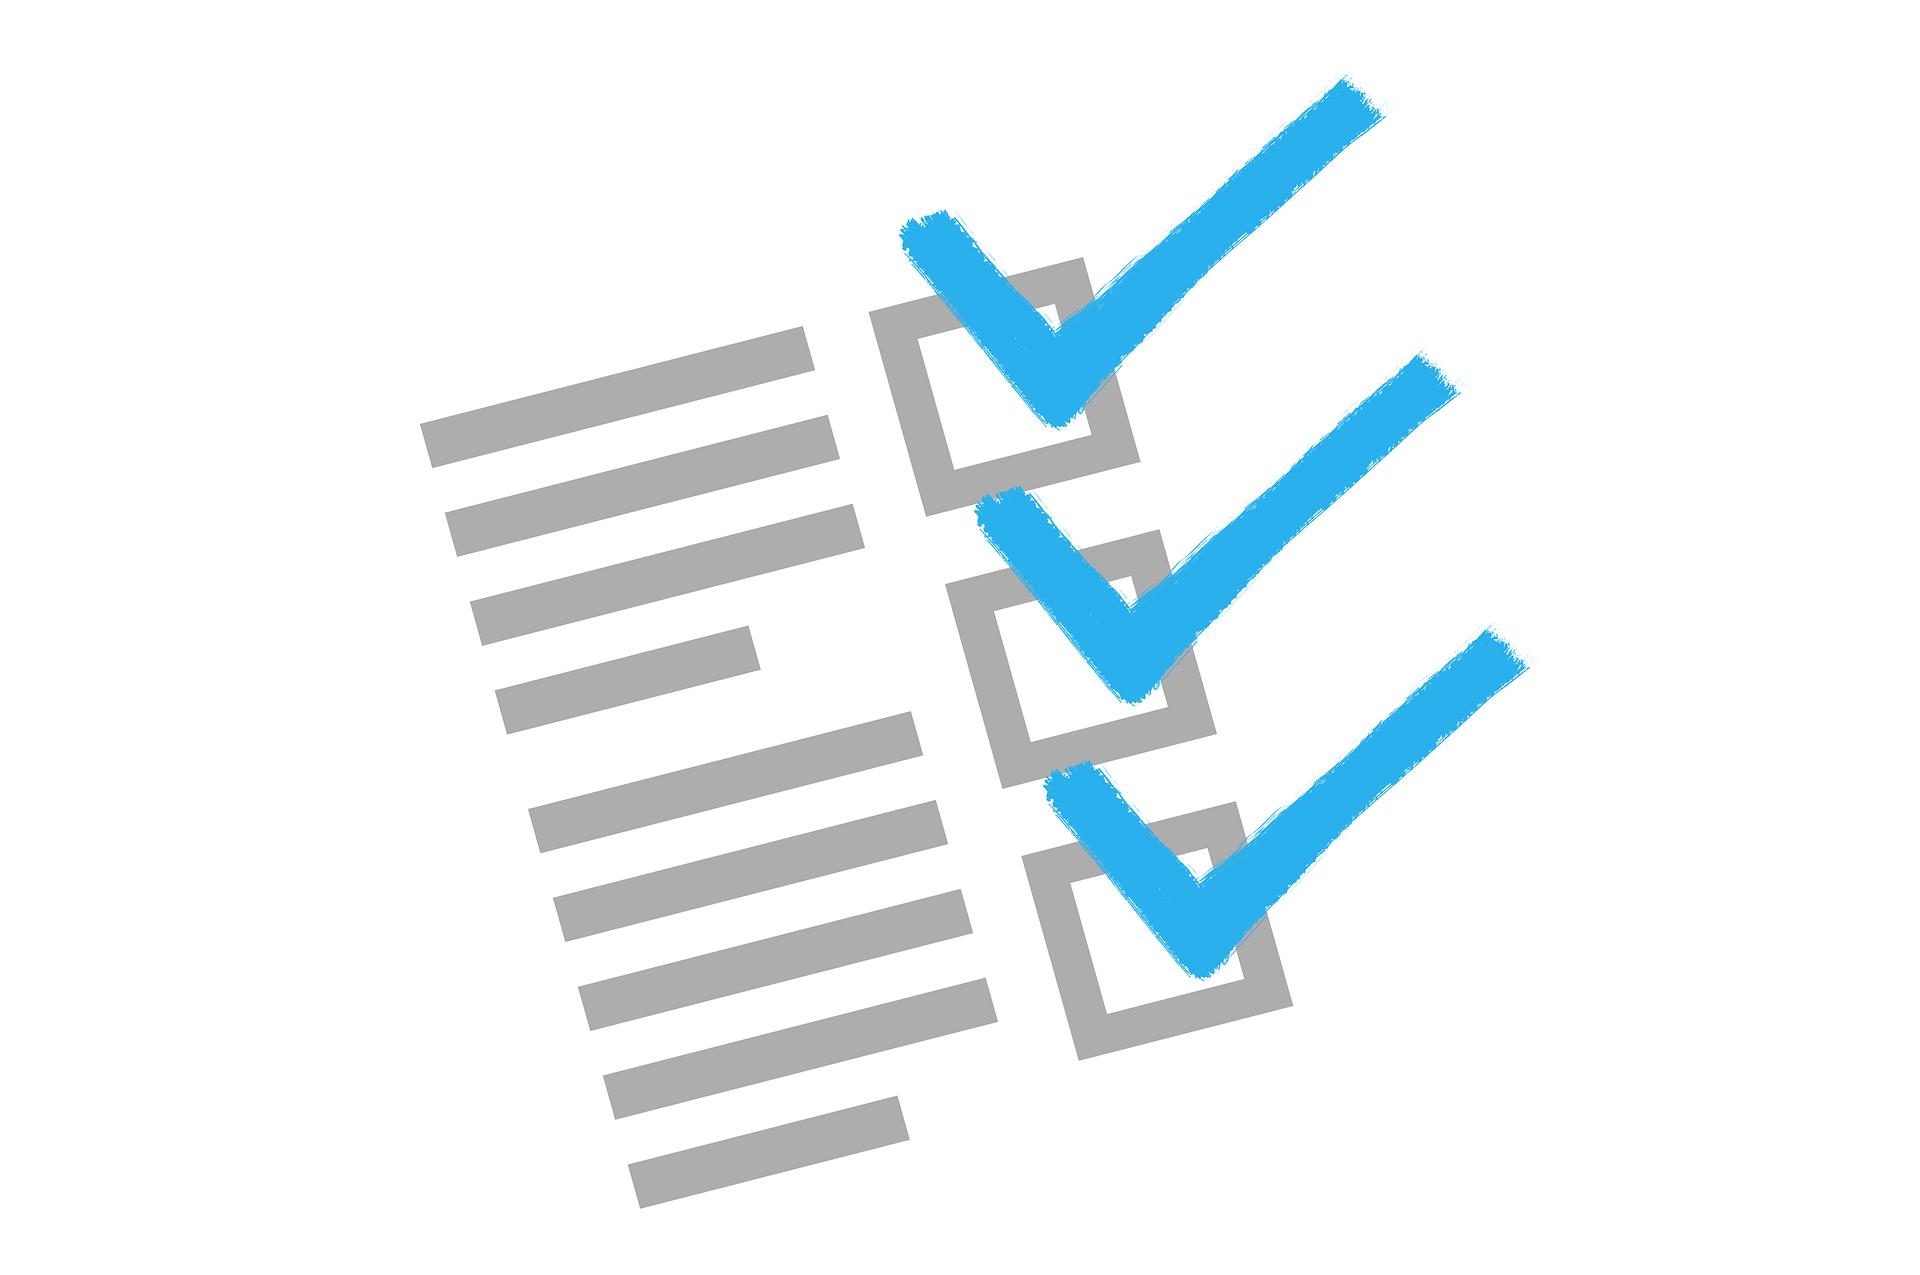 Checklist de contrôle